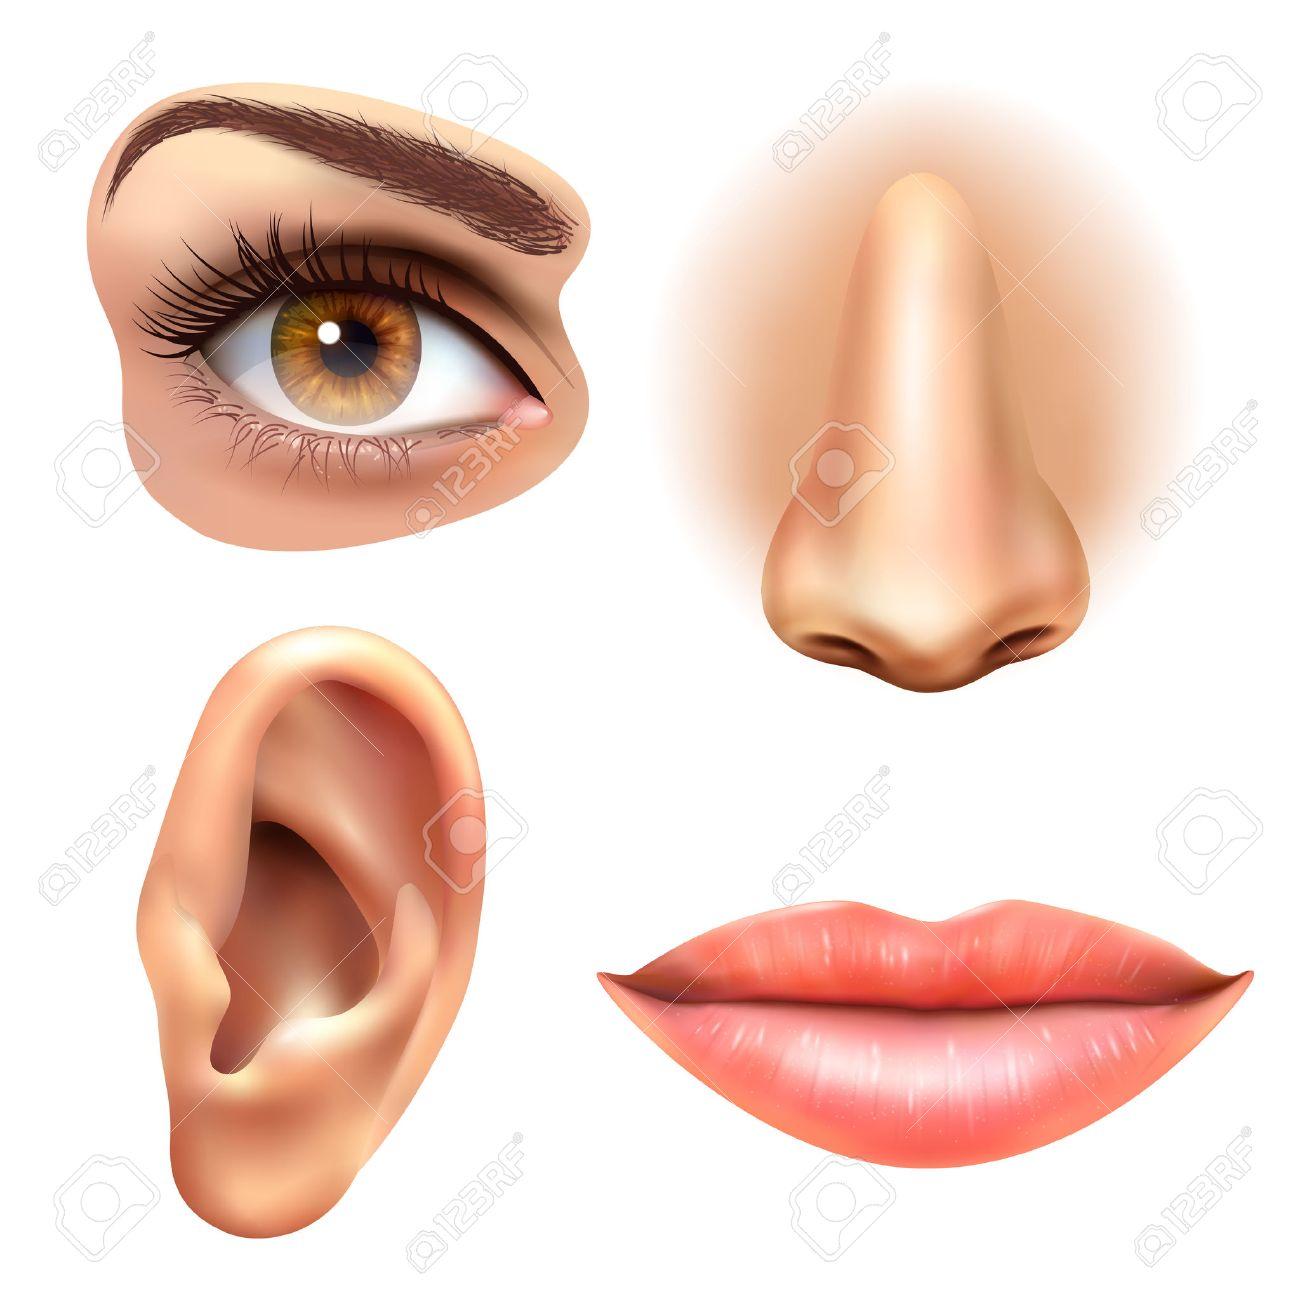 Human Face Parts 4 Sense Organs Icons Square Collection Of Eye ...